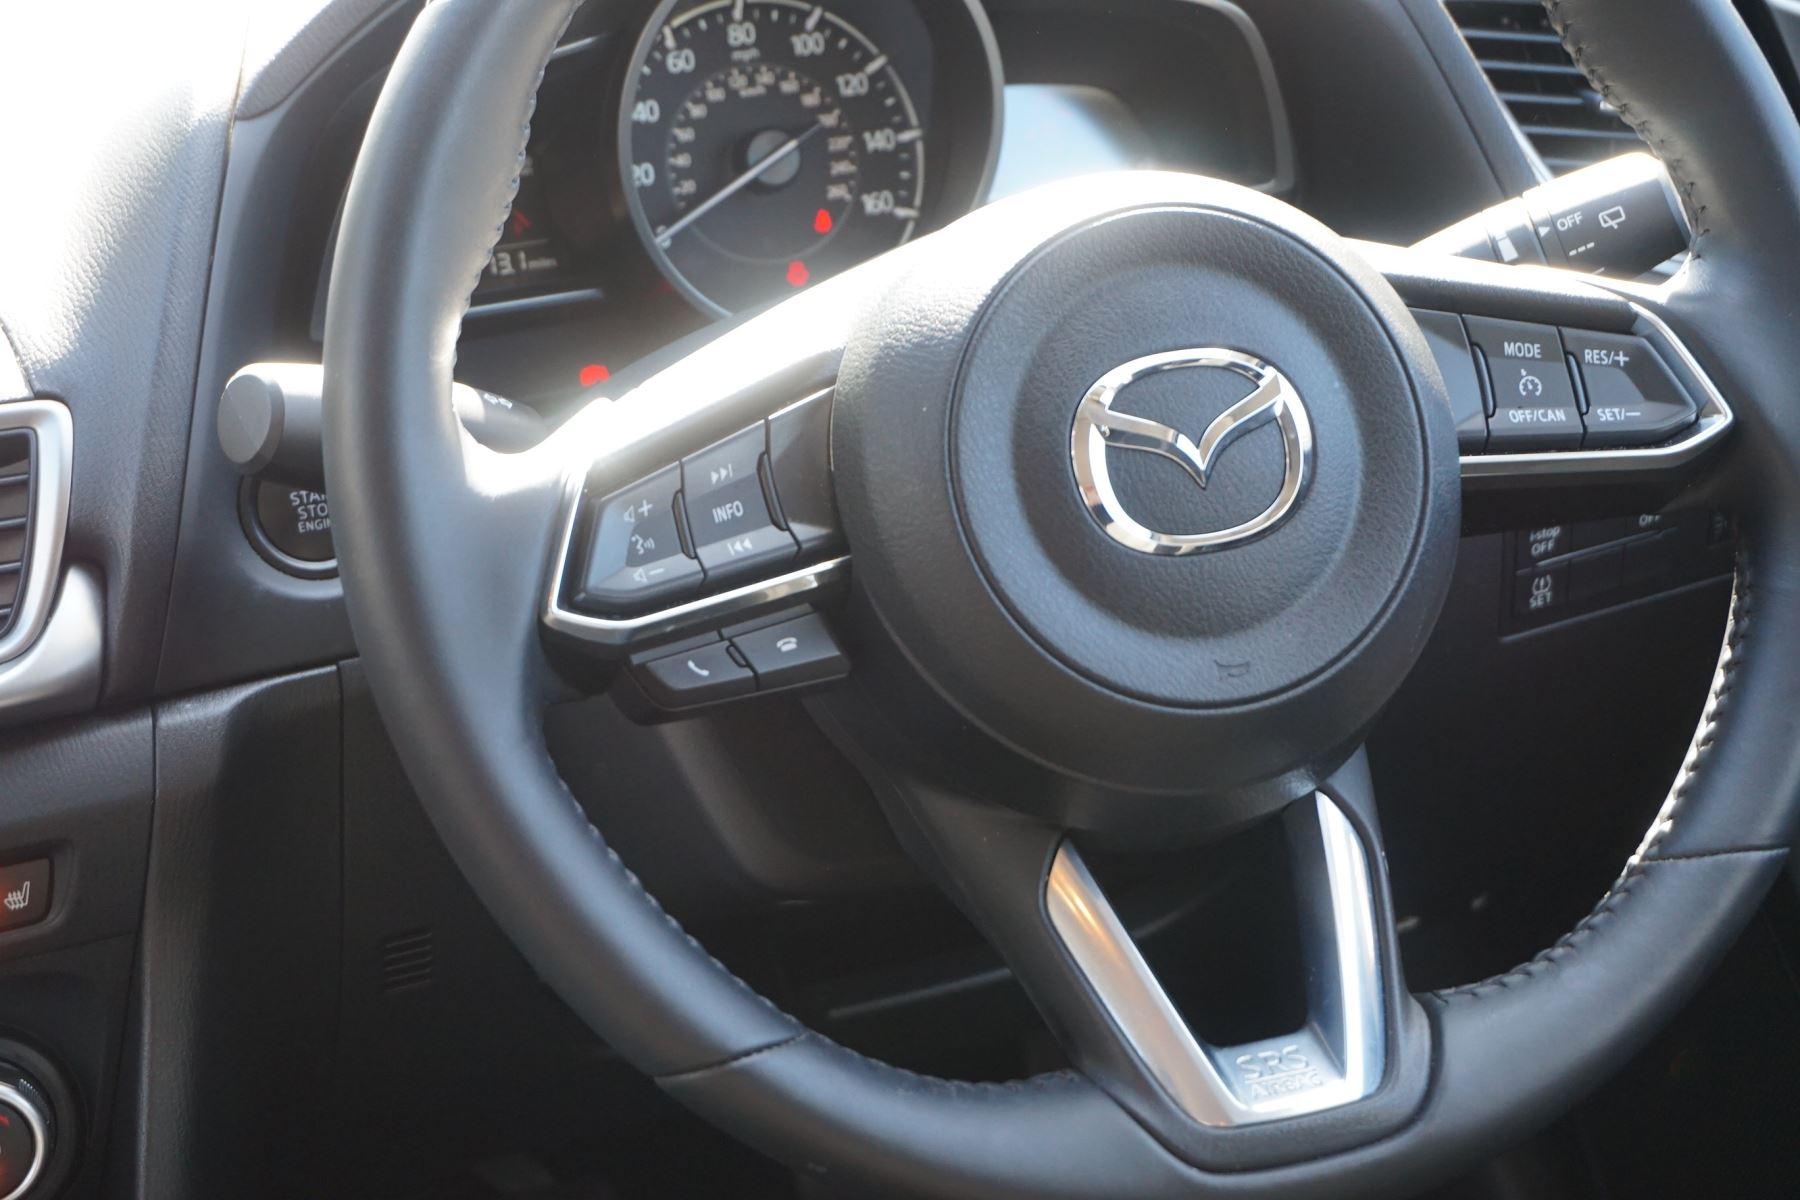 Mazda 3 2.2d SE-L Nav 5dr image 13